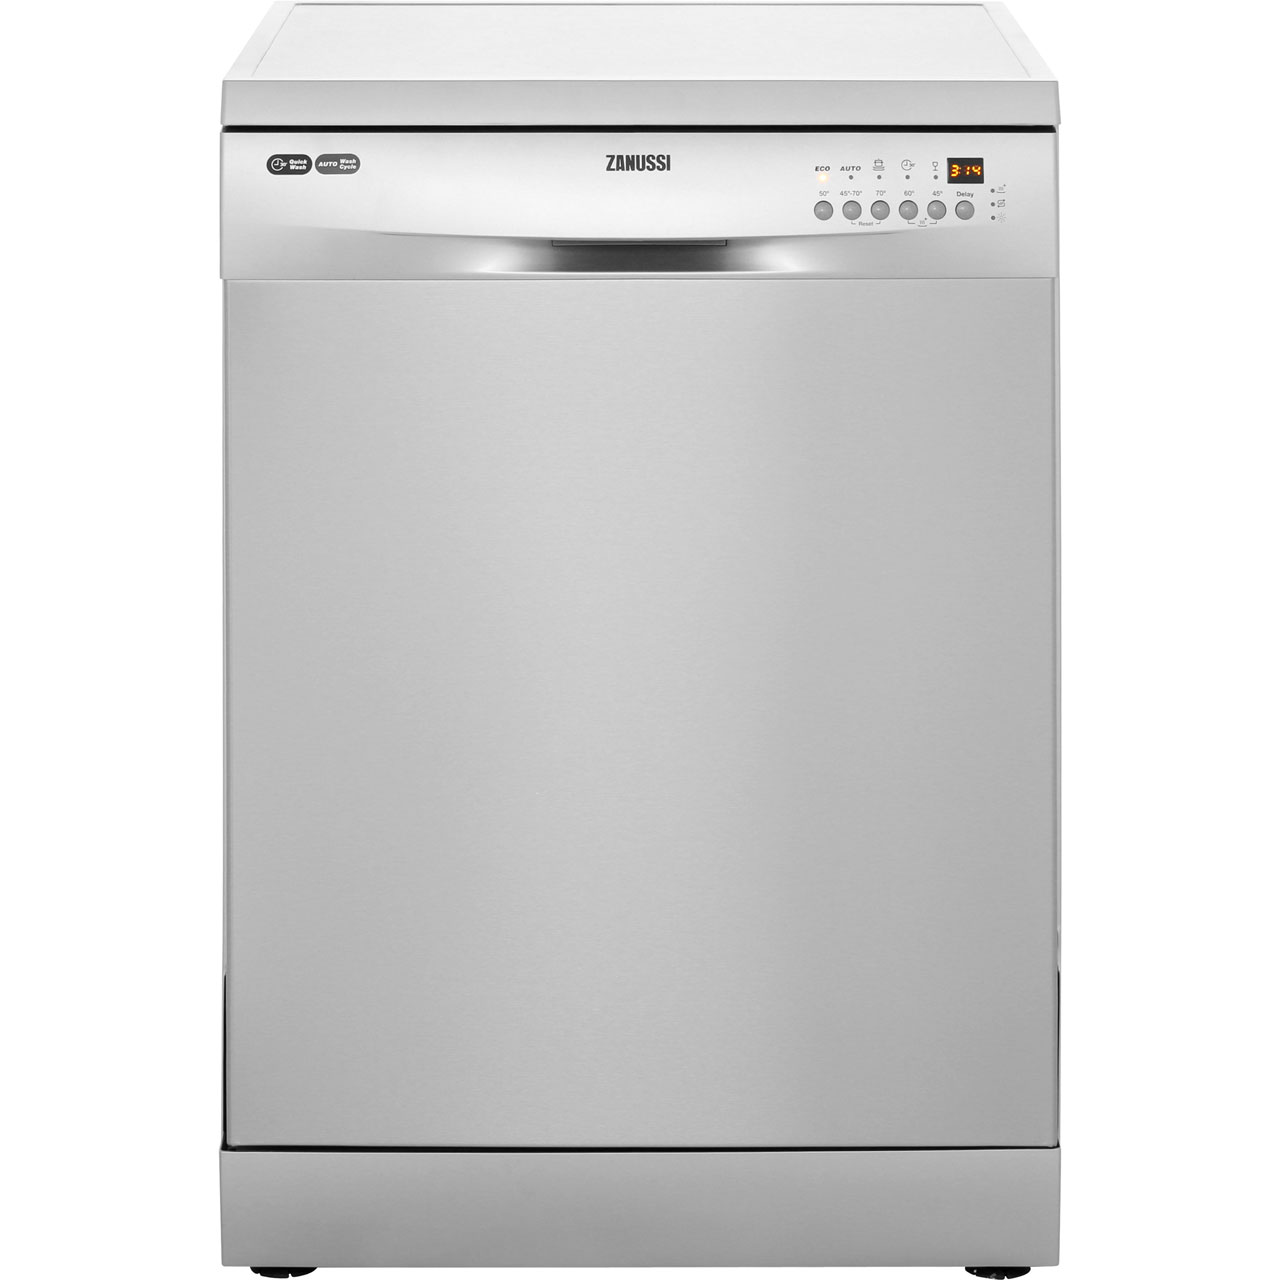 Zanussi Avanti ZDF26003XA Free Standing Dishwasher in Stainless Steel